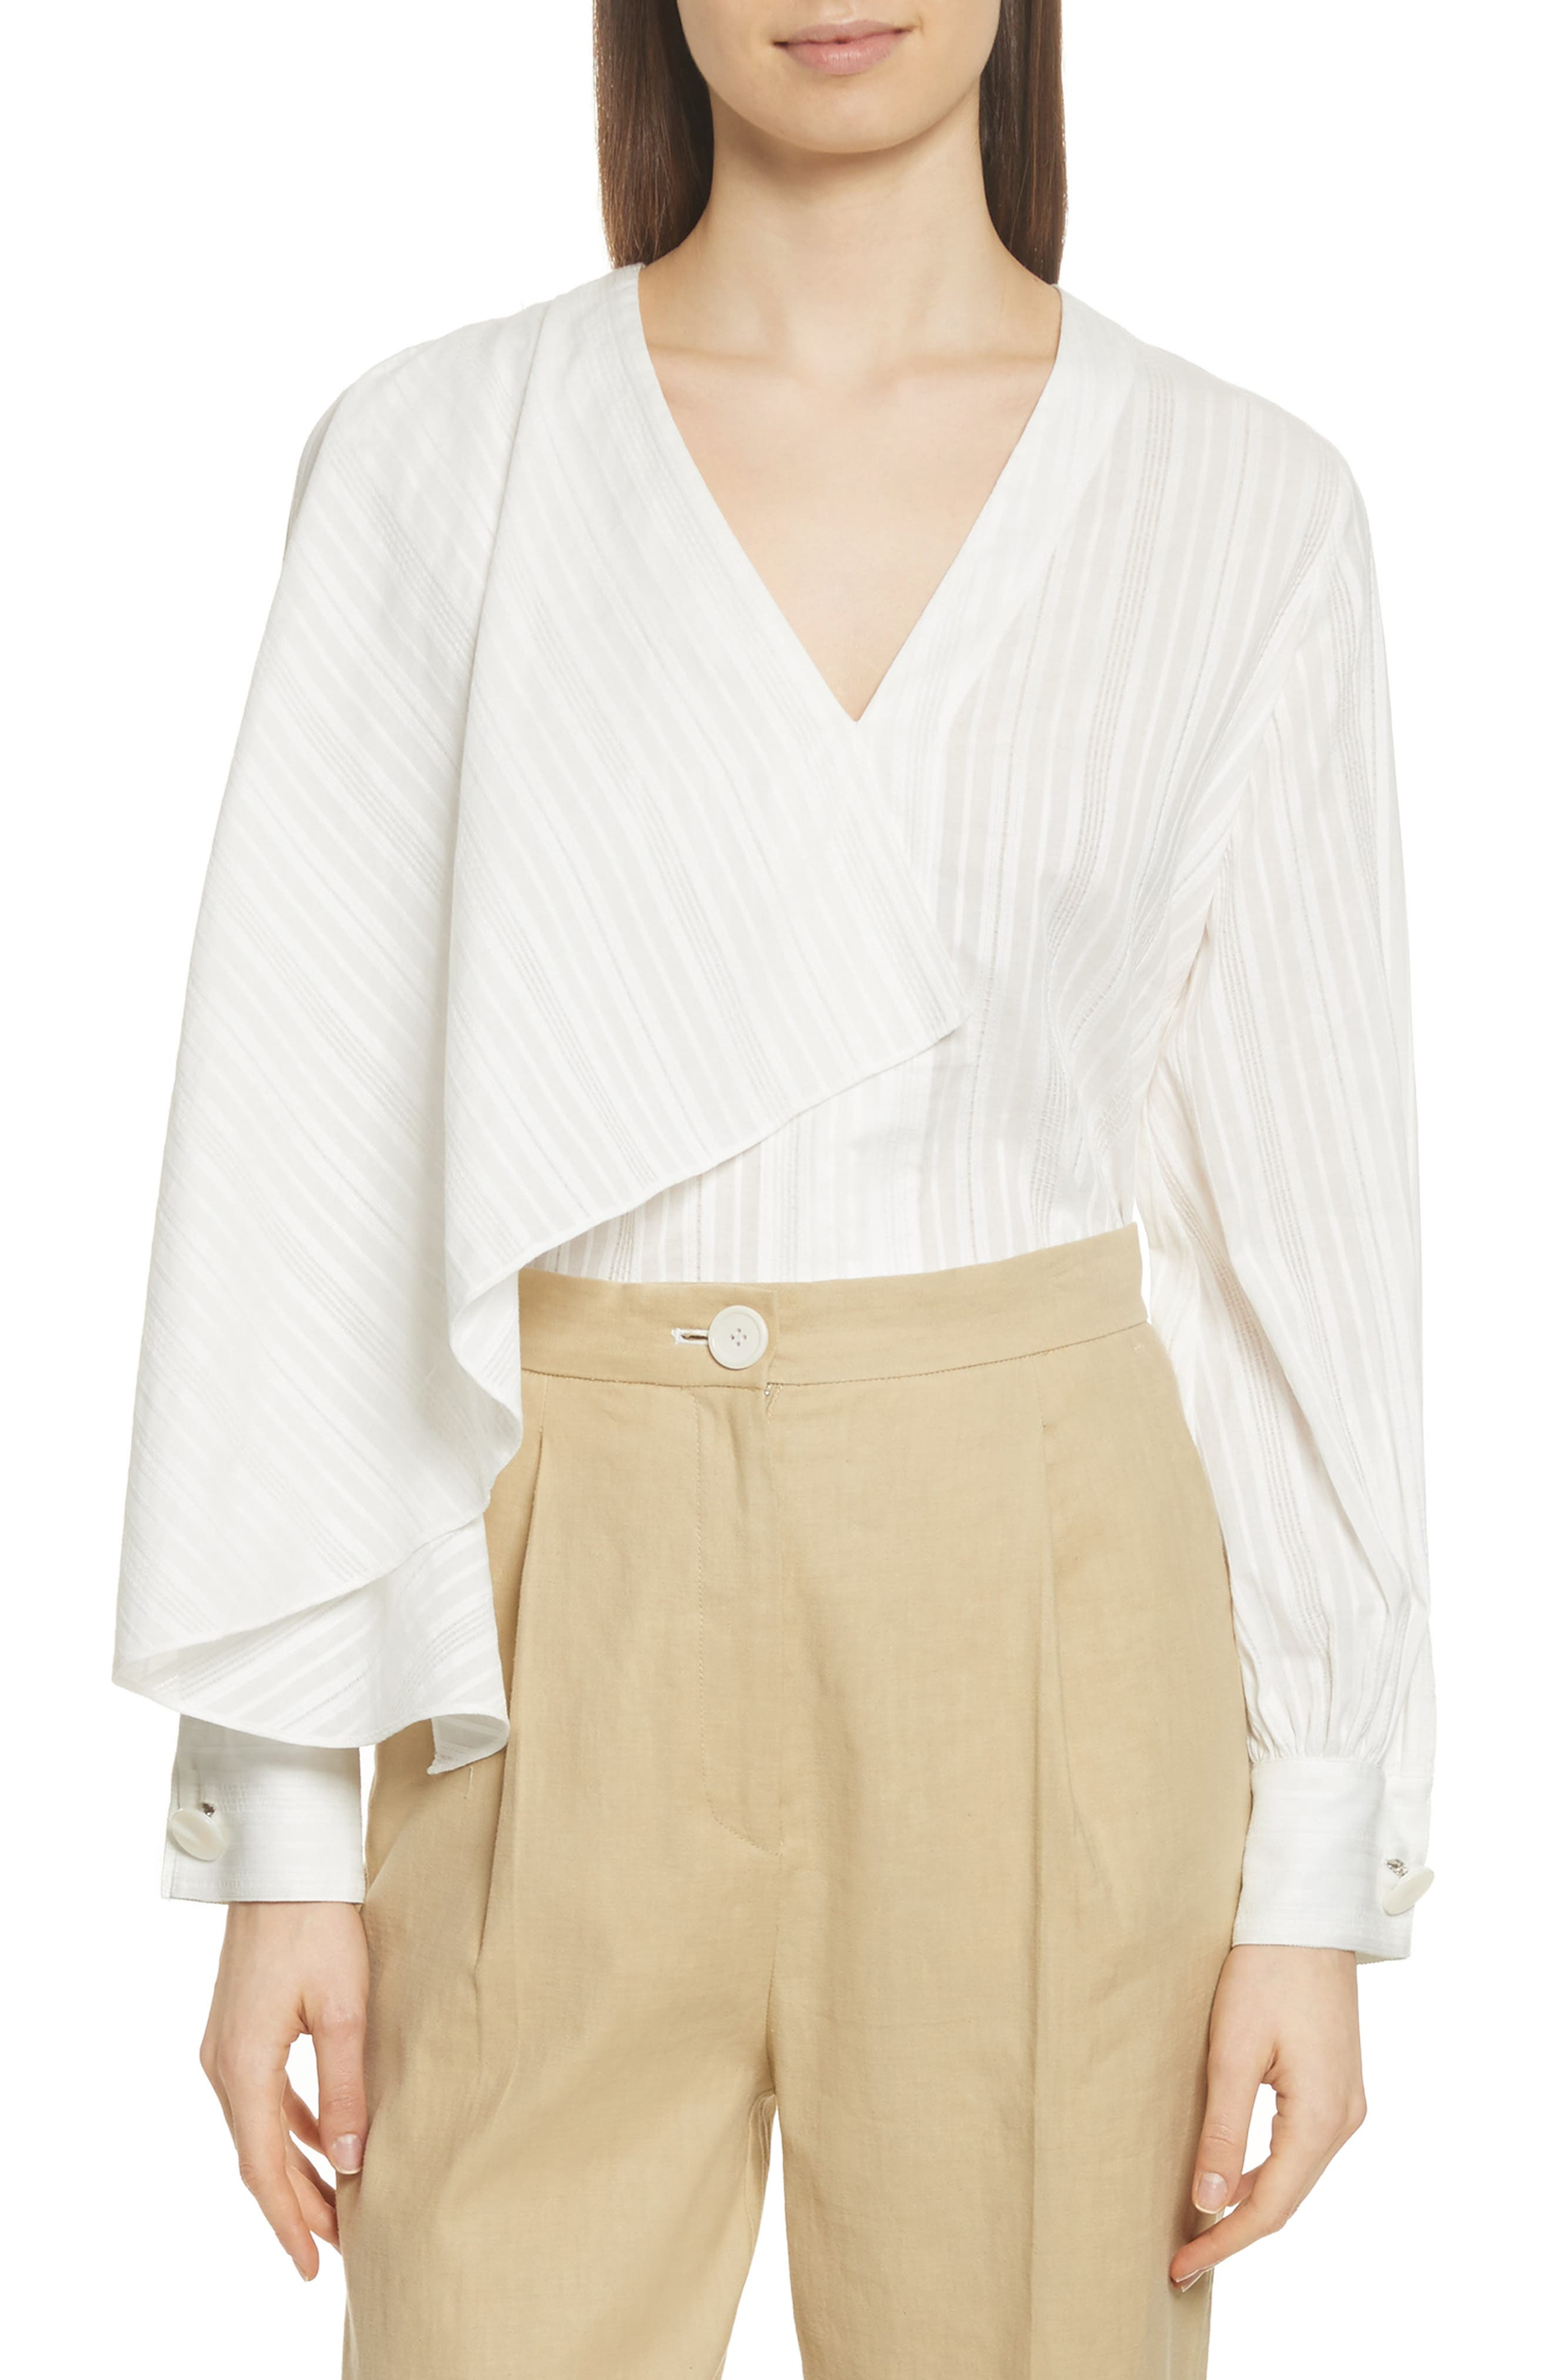 Alternate Image 1 Selected - Robert Rodriguez Stripe Drape Front Blouse